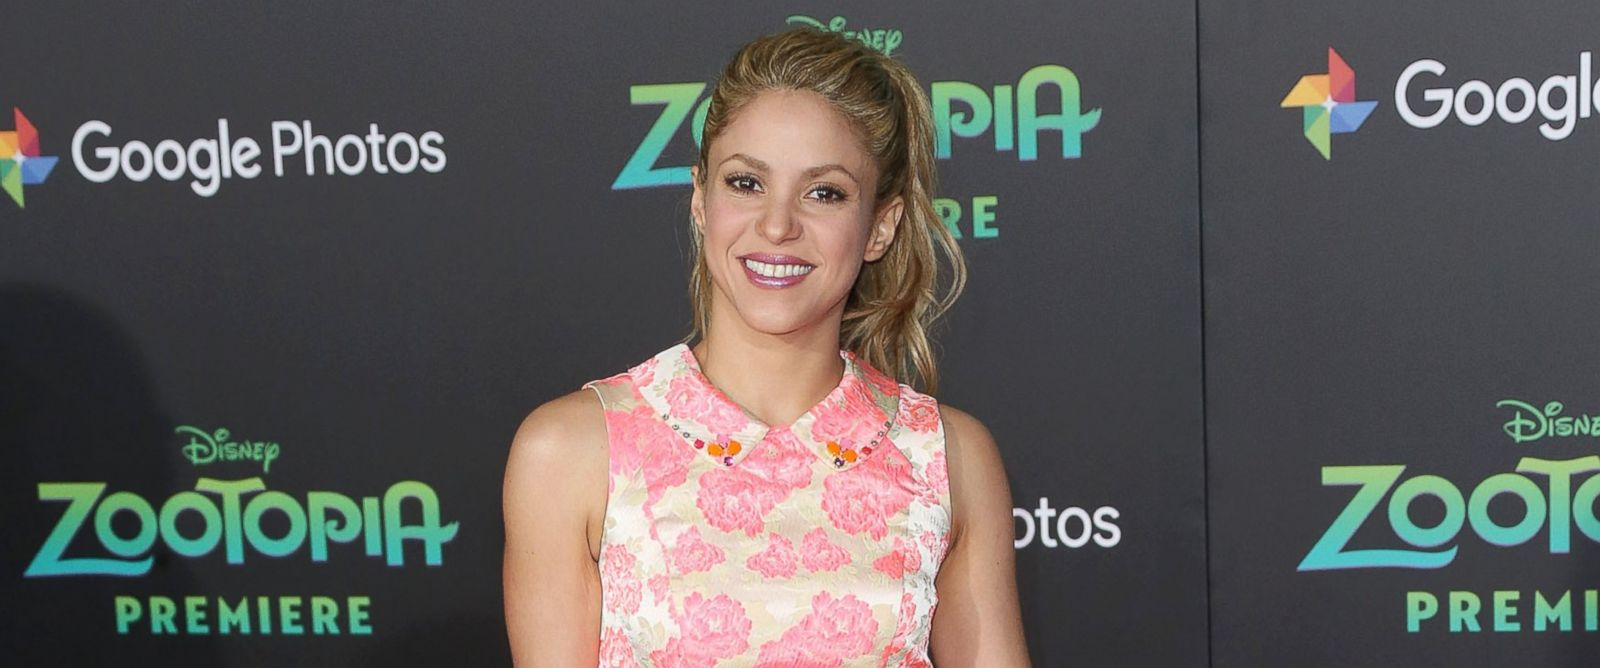 "PHOTO: Shakira attends the Premiere of Walt Disney Animation Studios ""Zootopia"" at the El Capitan Theatre, Feb. 17, 2016 in Hollywood, California."